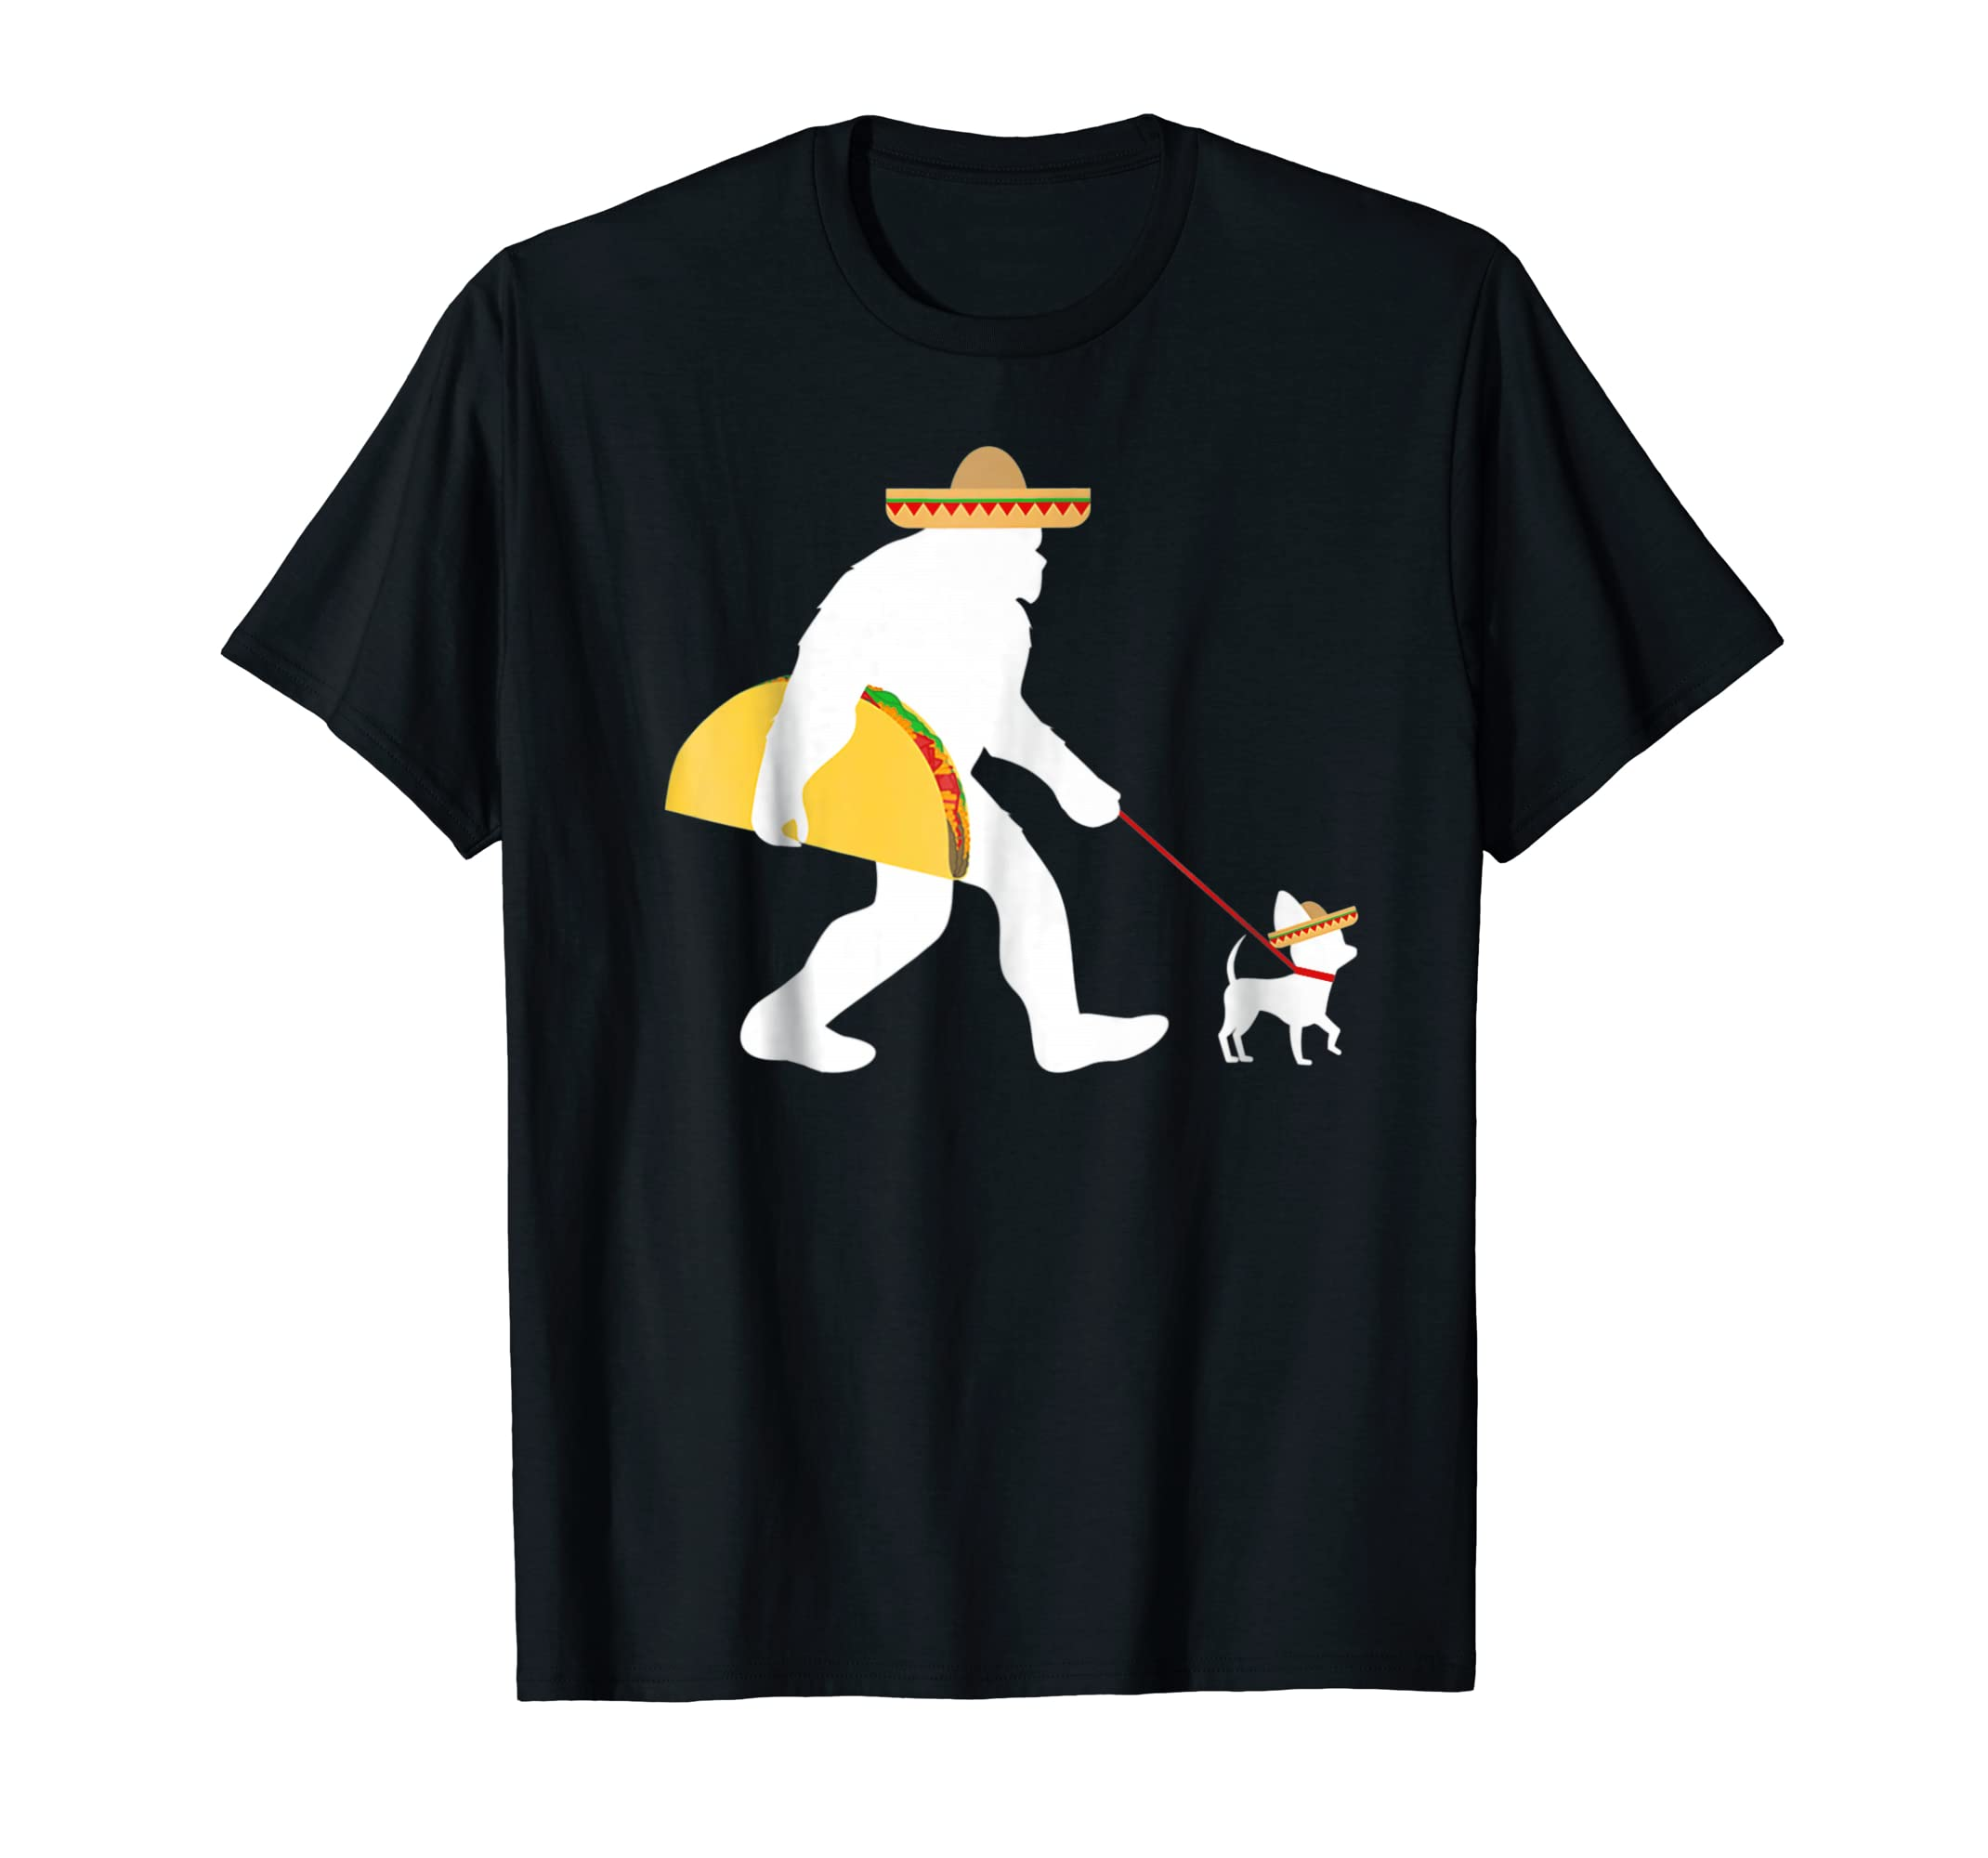 Bigfoot Taco Sombrero Chihuahua Dog Cinco de Mayo T-shirt-Men's T-Shirt-Black